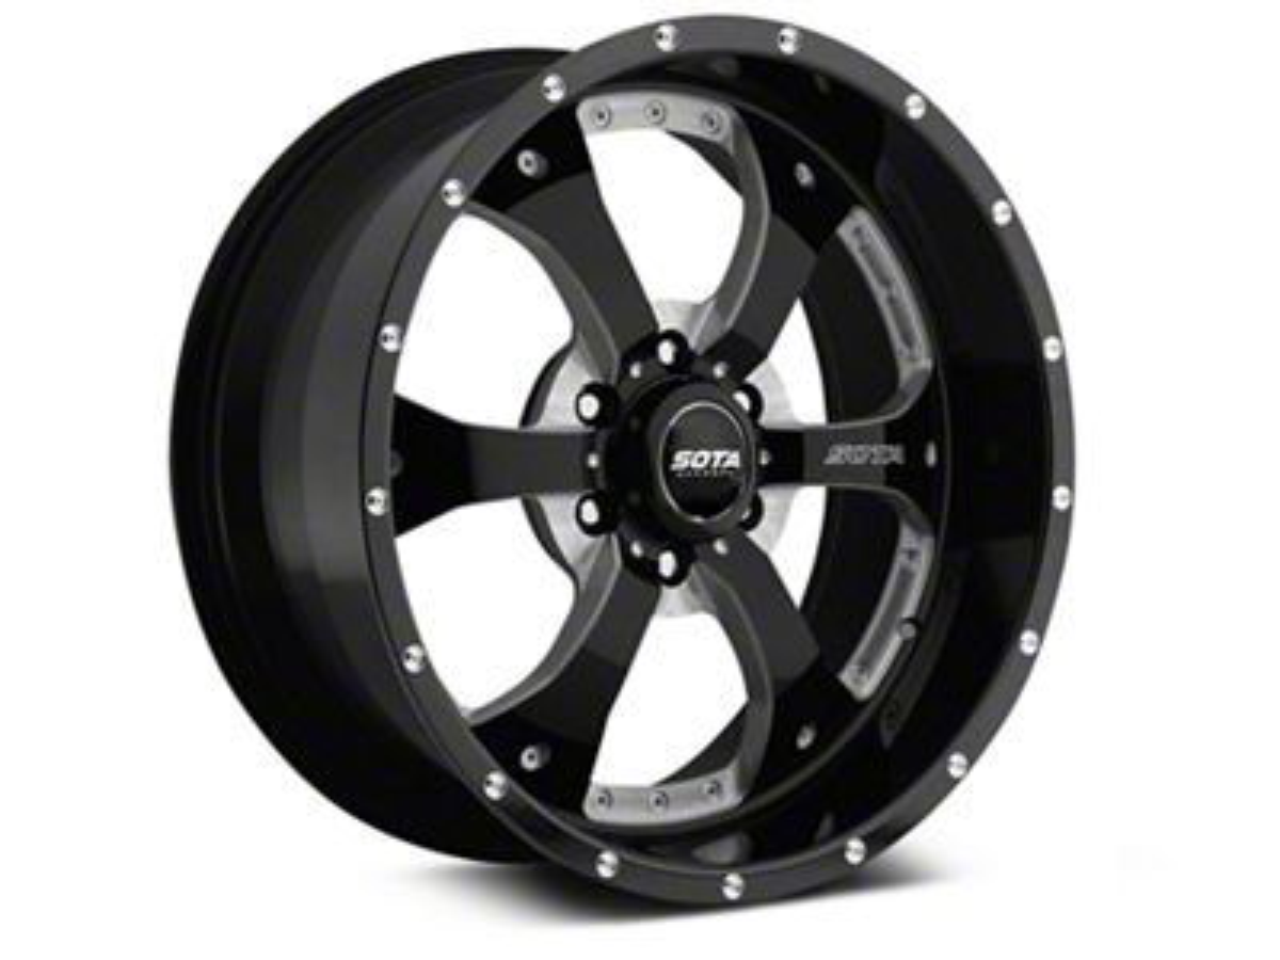 SOTA Off Road NOVAKANE Death Metal 6-Lug Wheel - 22x9.5 (99-18 Silverado 1500)